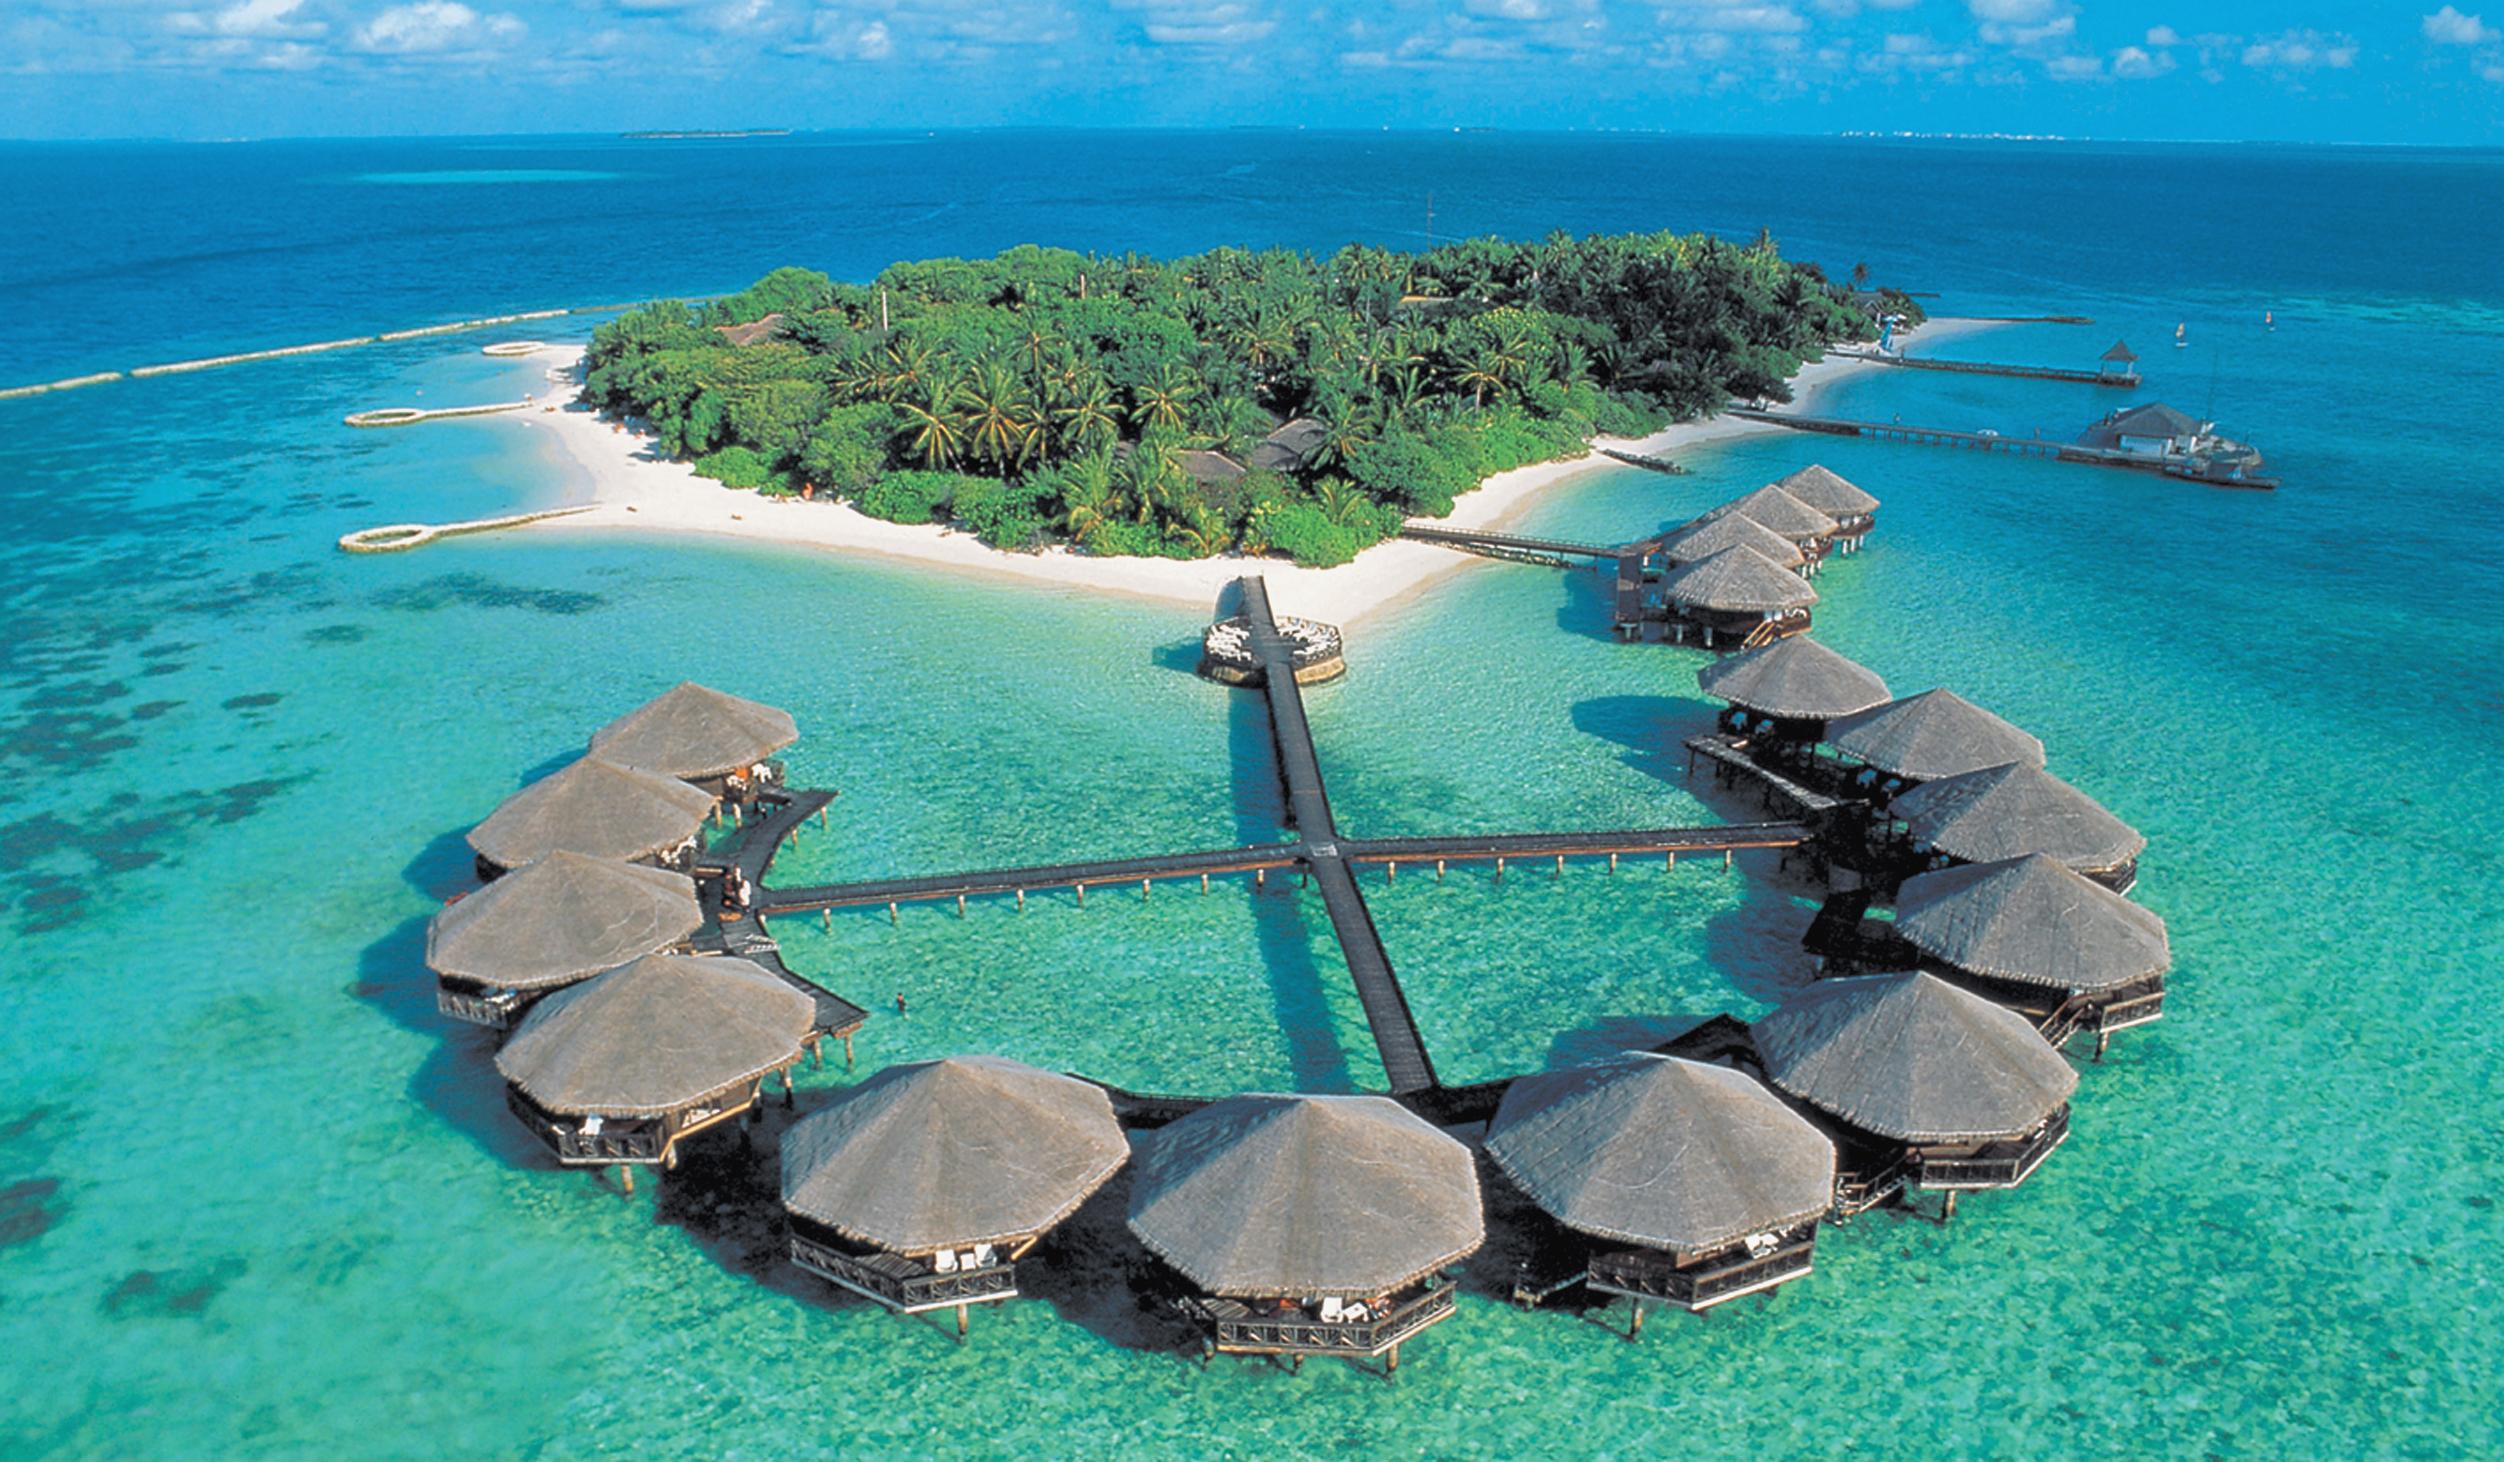 Maldives - Breaktime